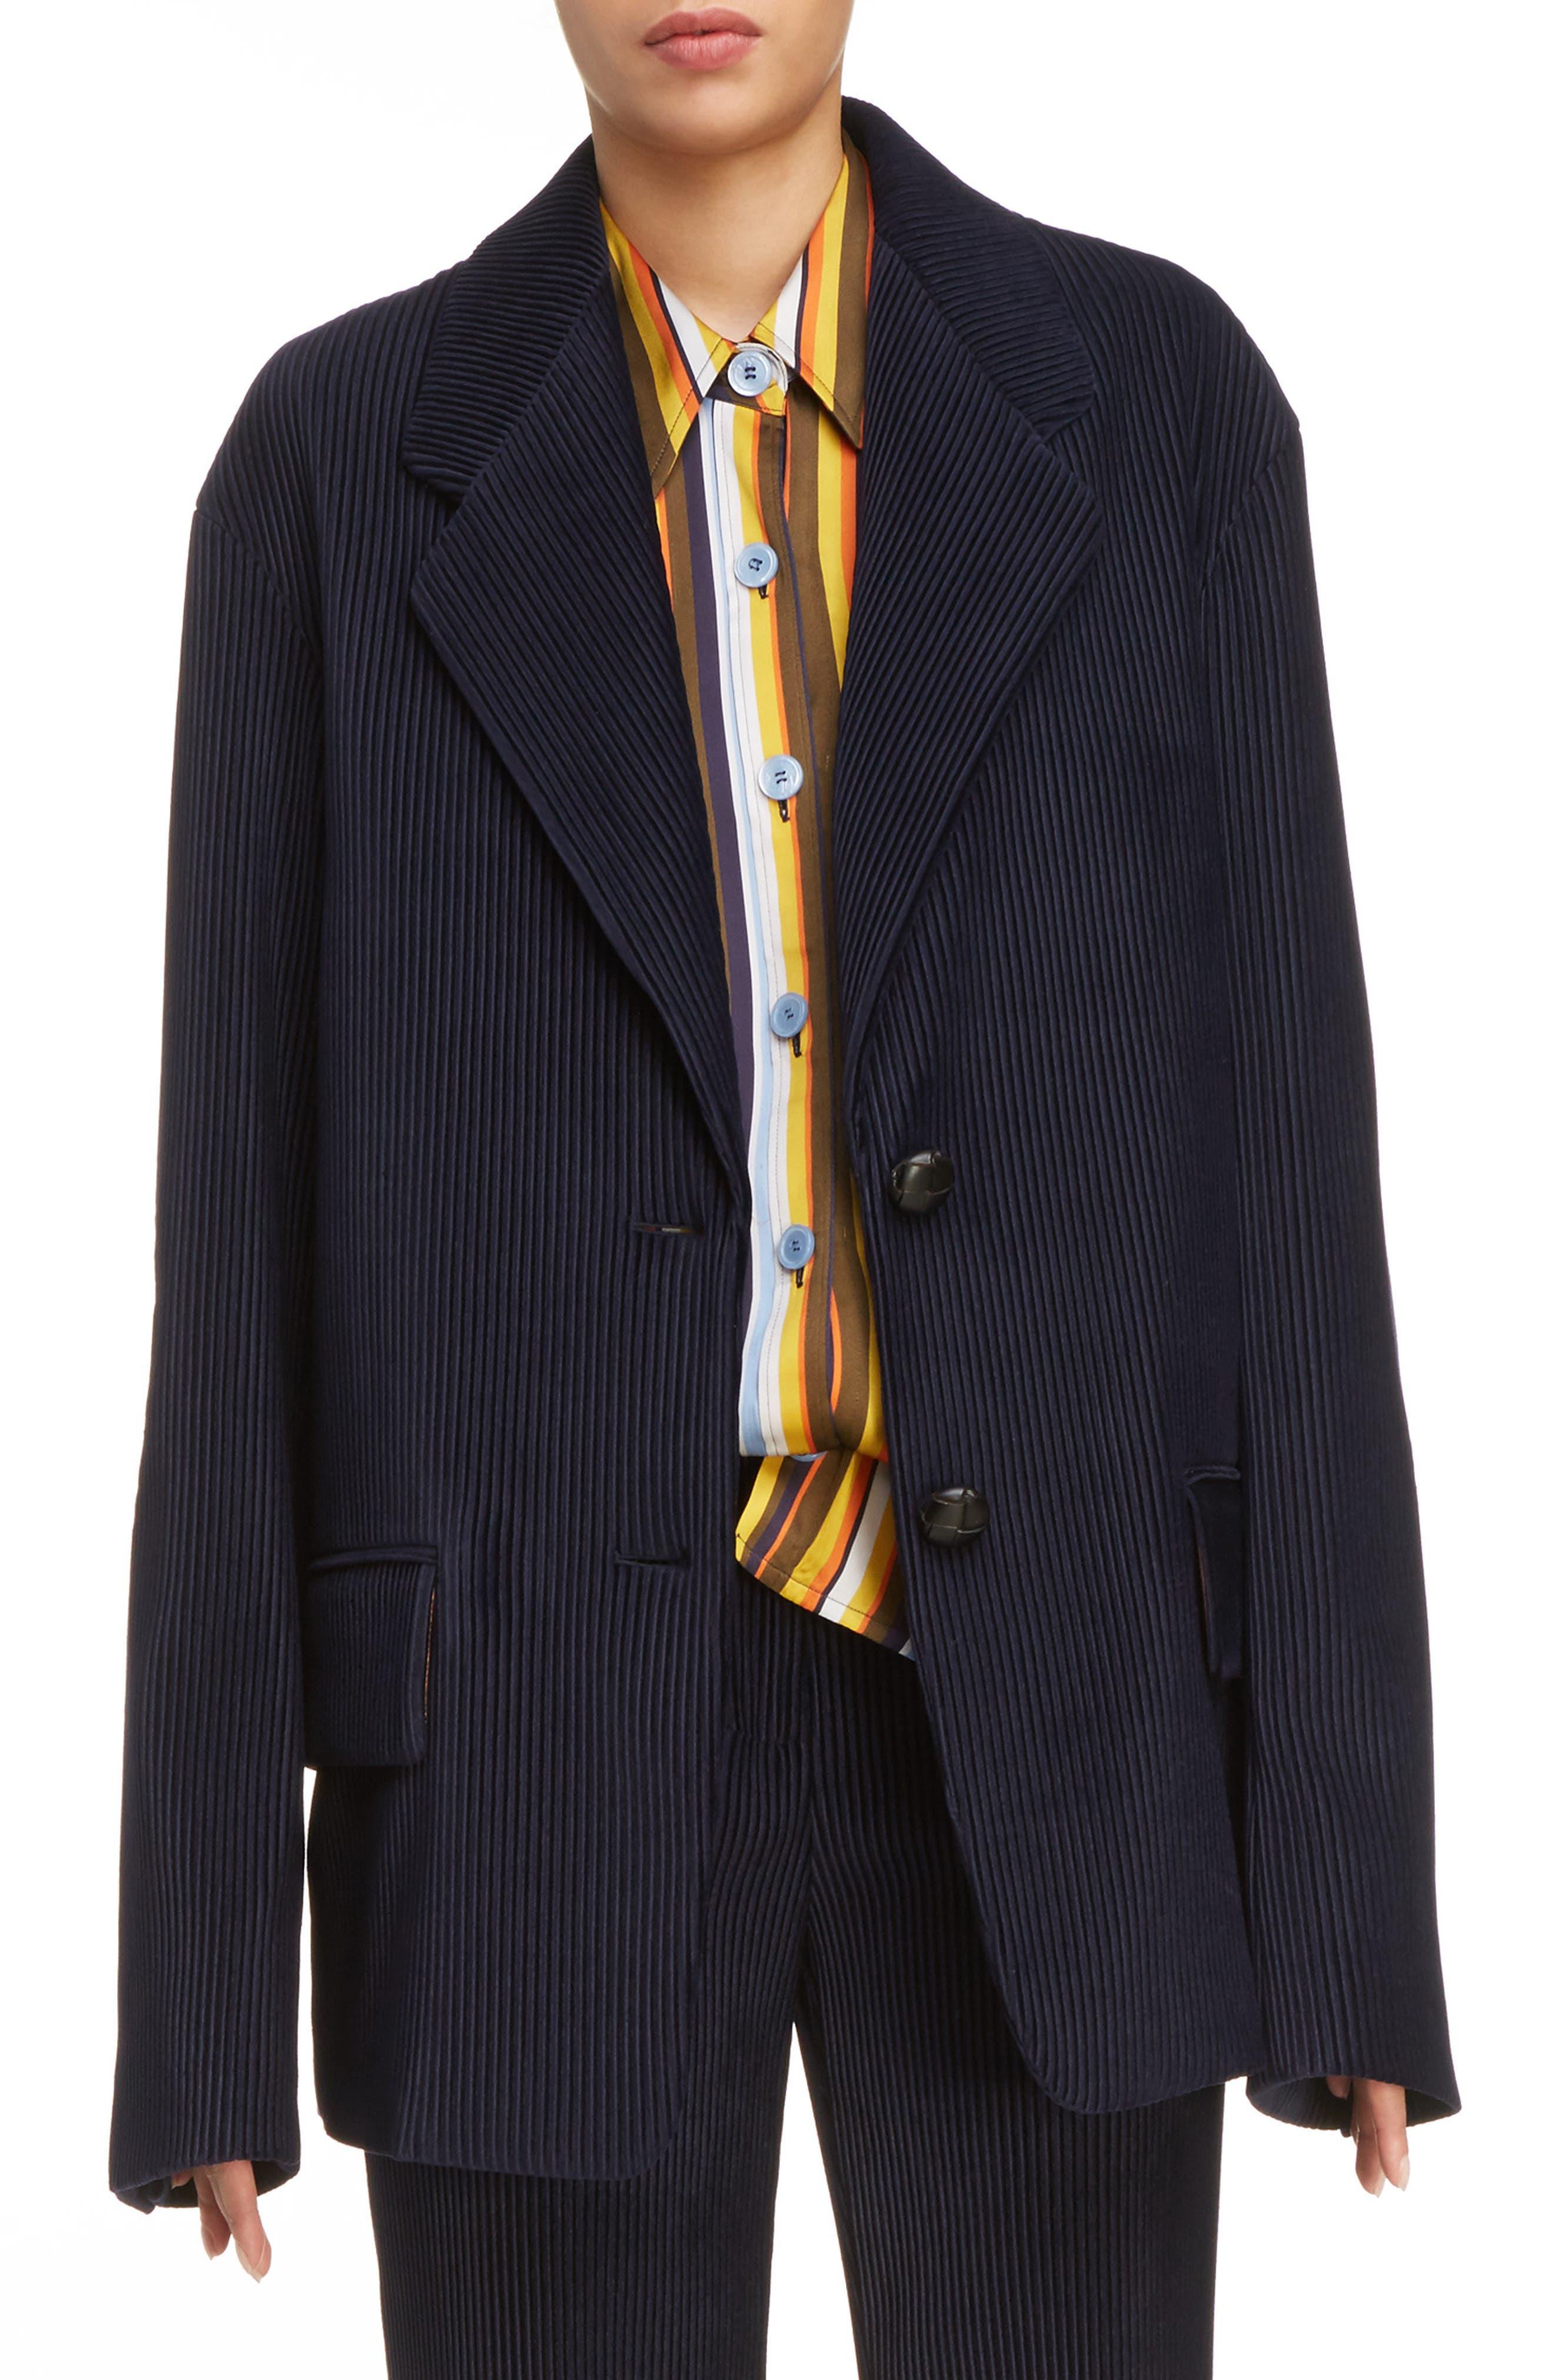 Juul Corduroy Jacket,                         Main,                         color, Navy